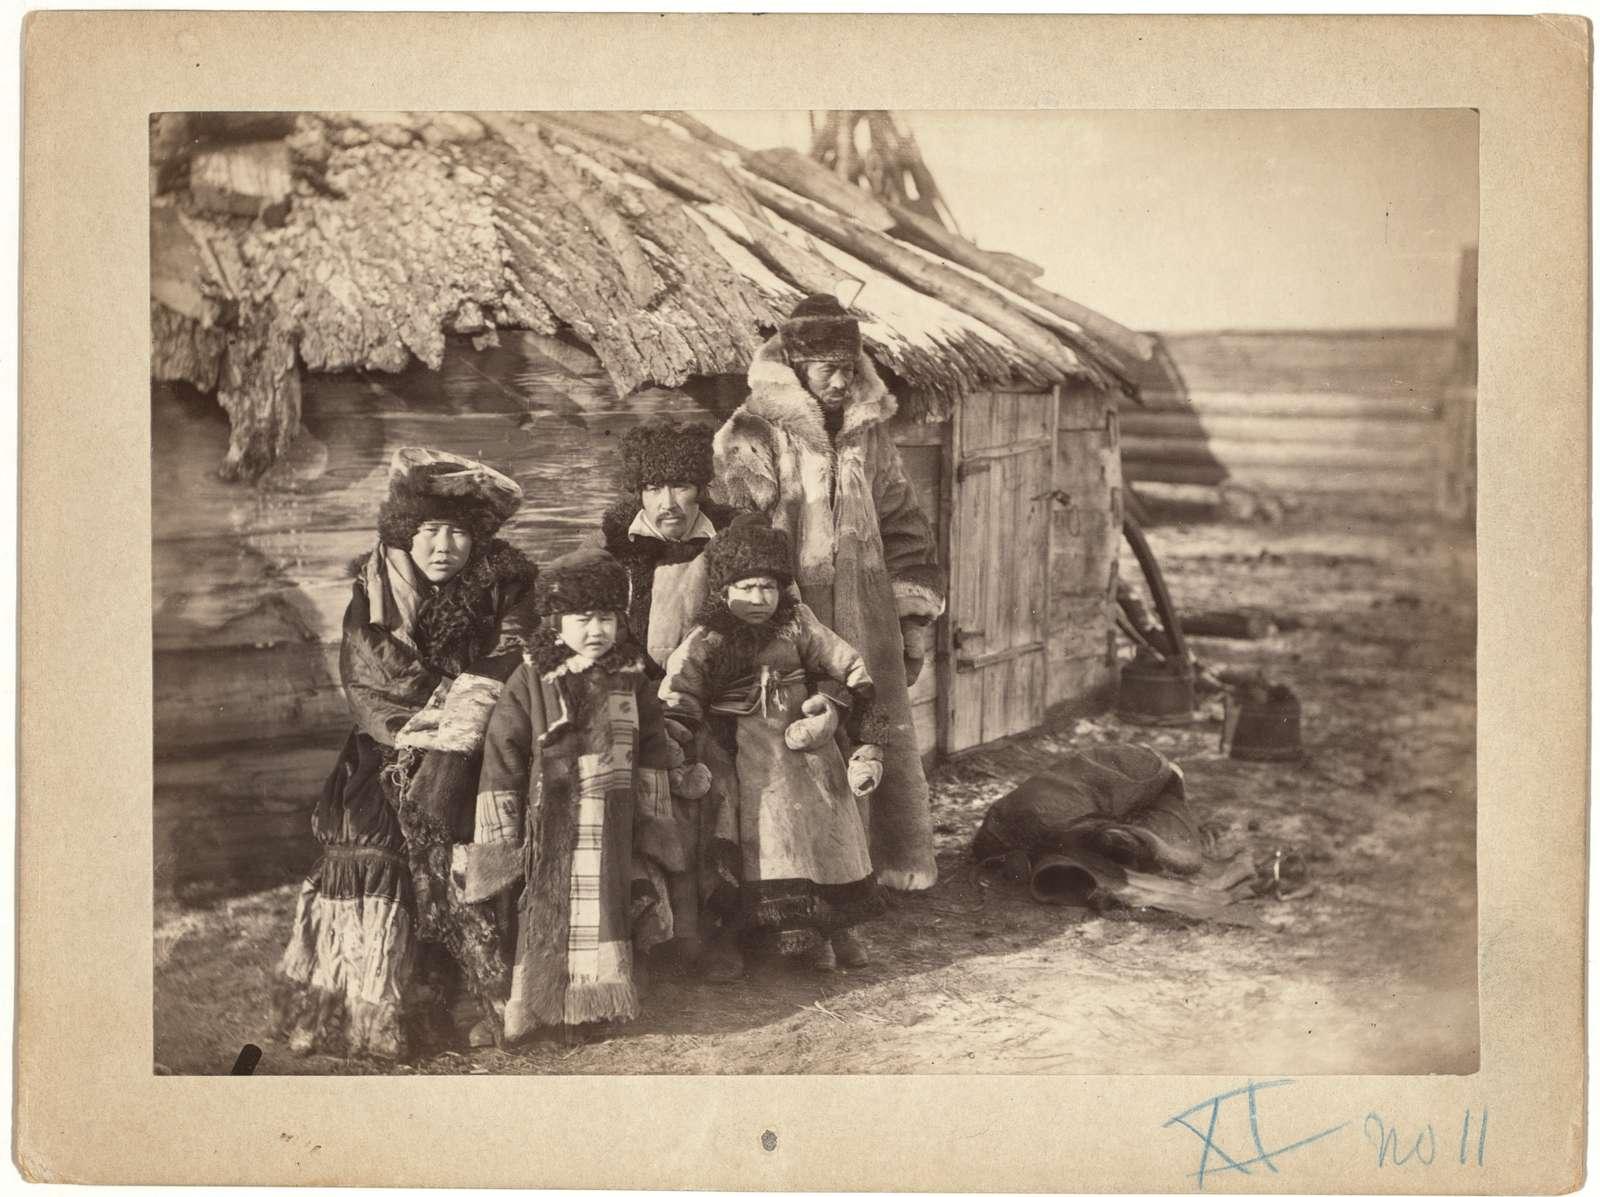 Group of Tartars [i.e., Tatars] at small village near Minisinsk [i.e, Minusinsk]